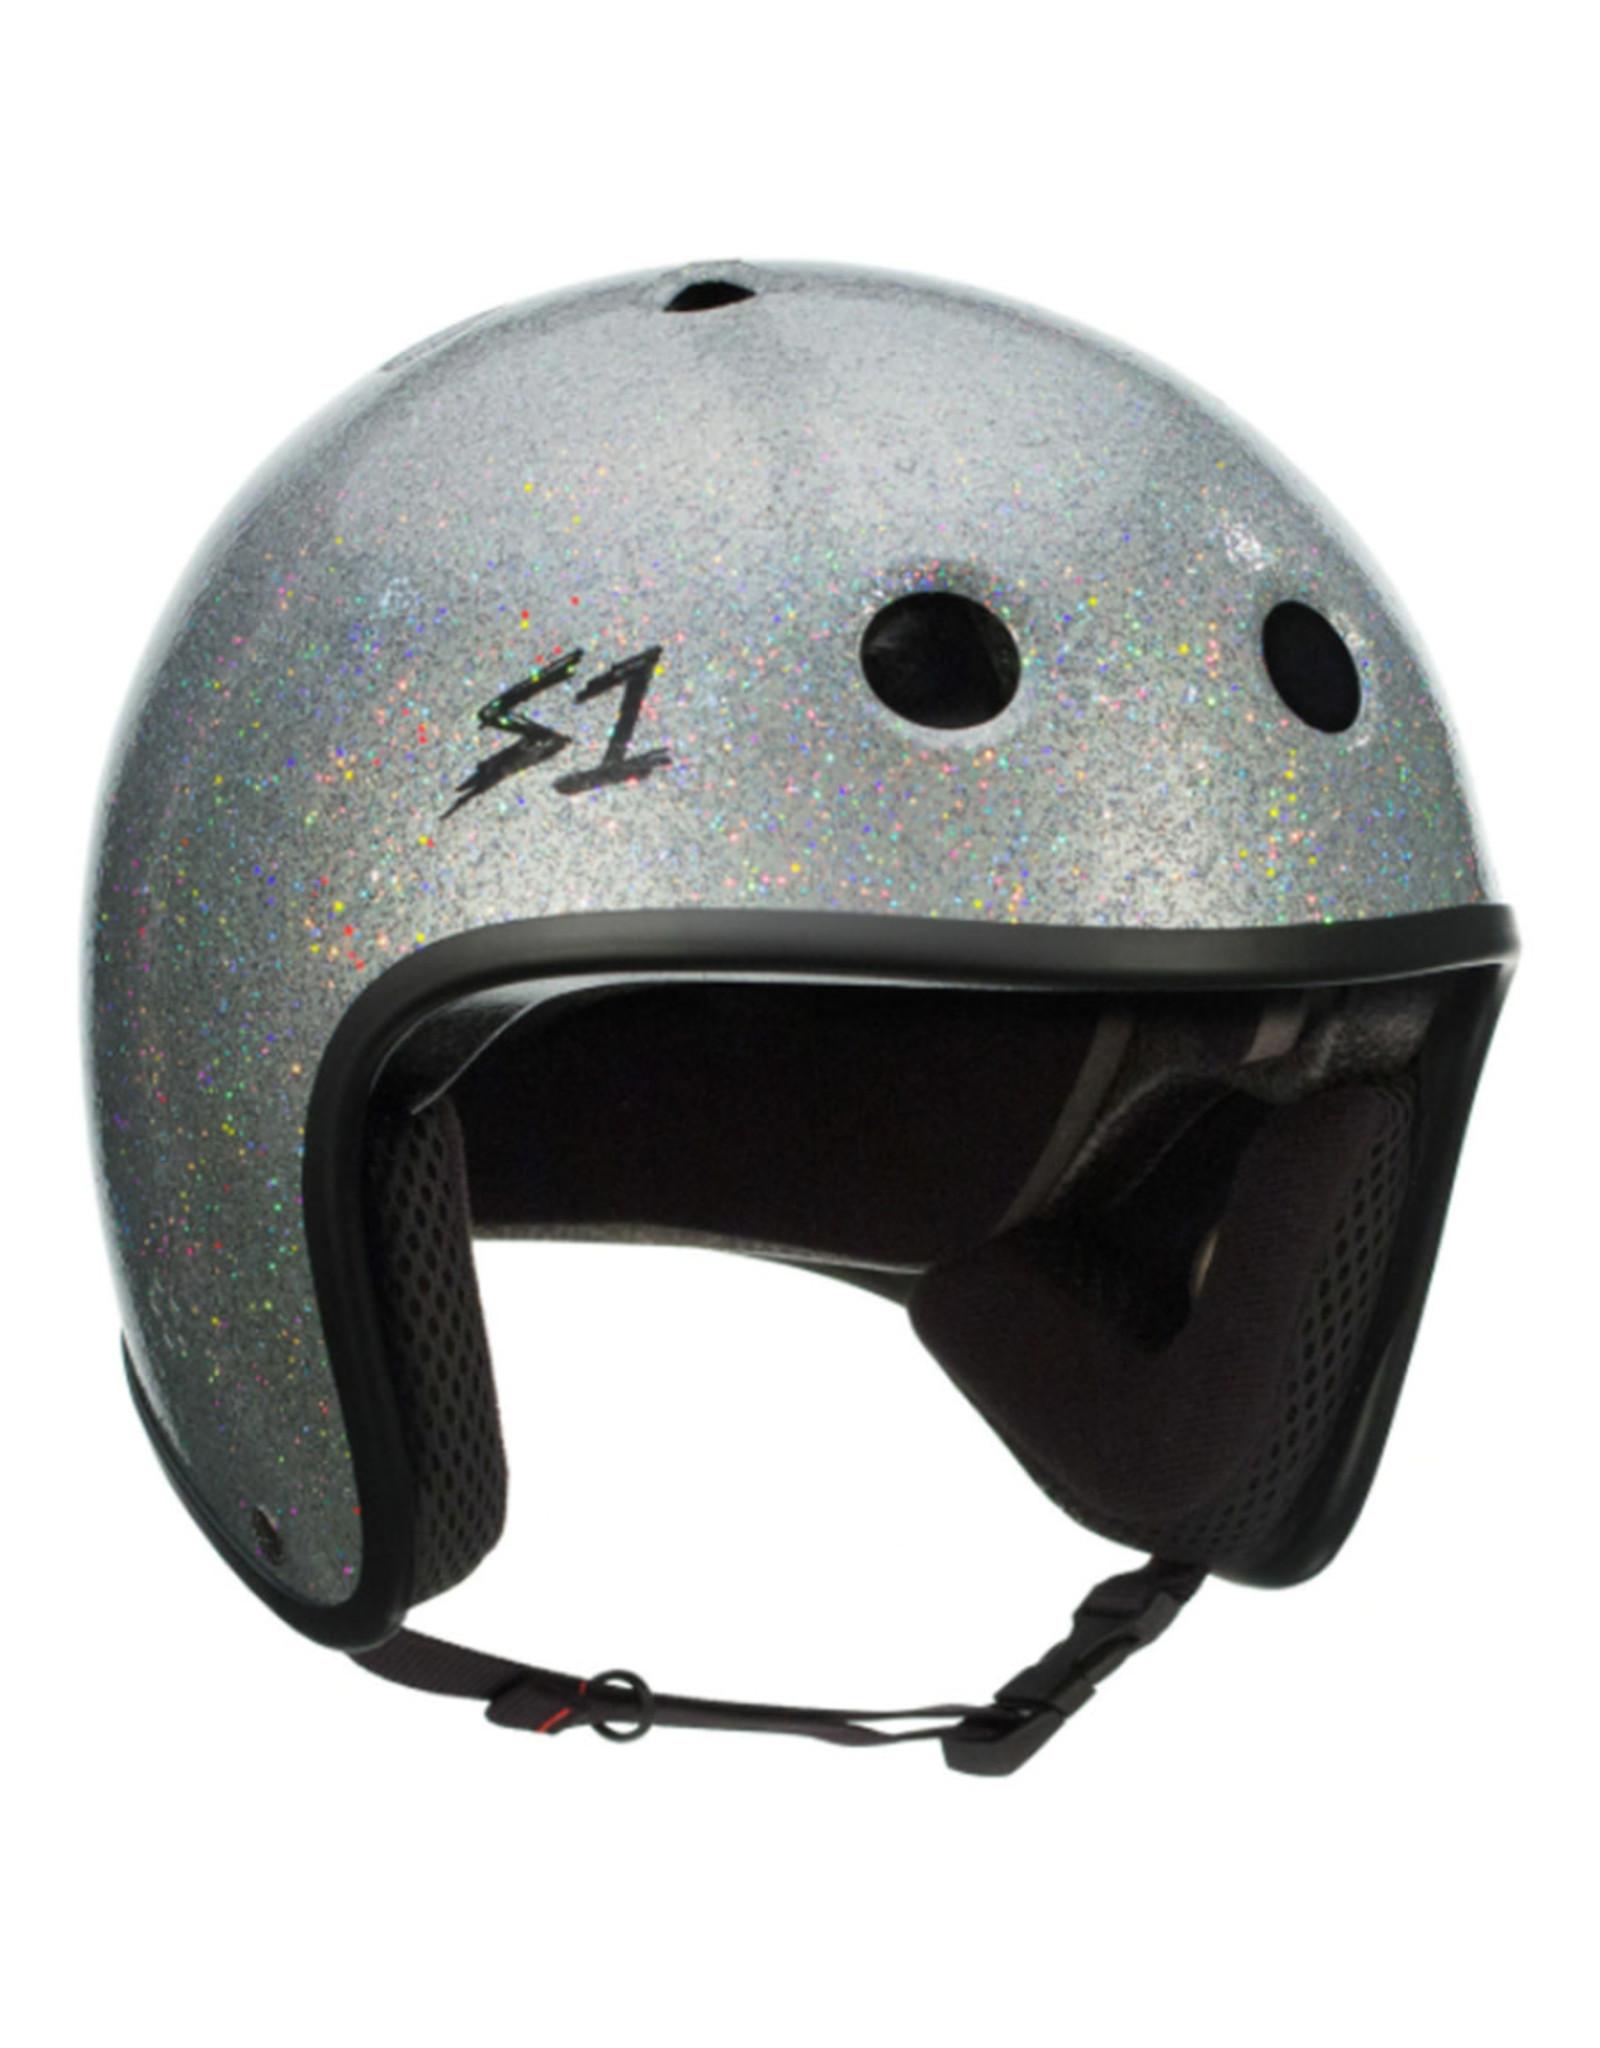 S-One S-One Helmet Adult Retro (Silver Glitter/Black Straps)